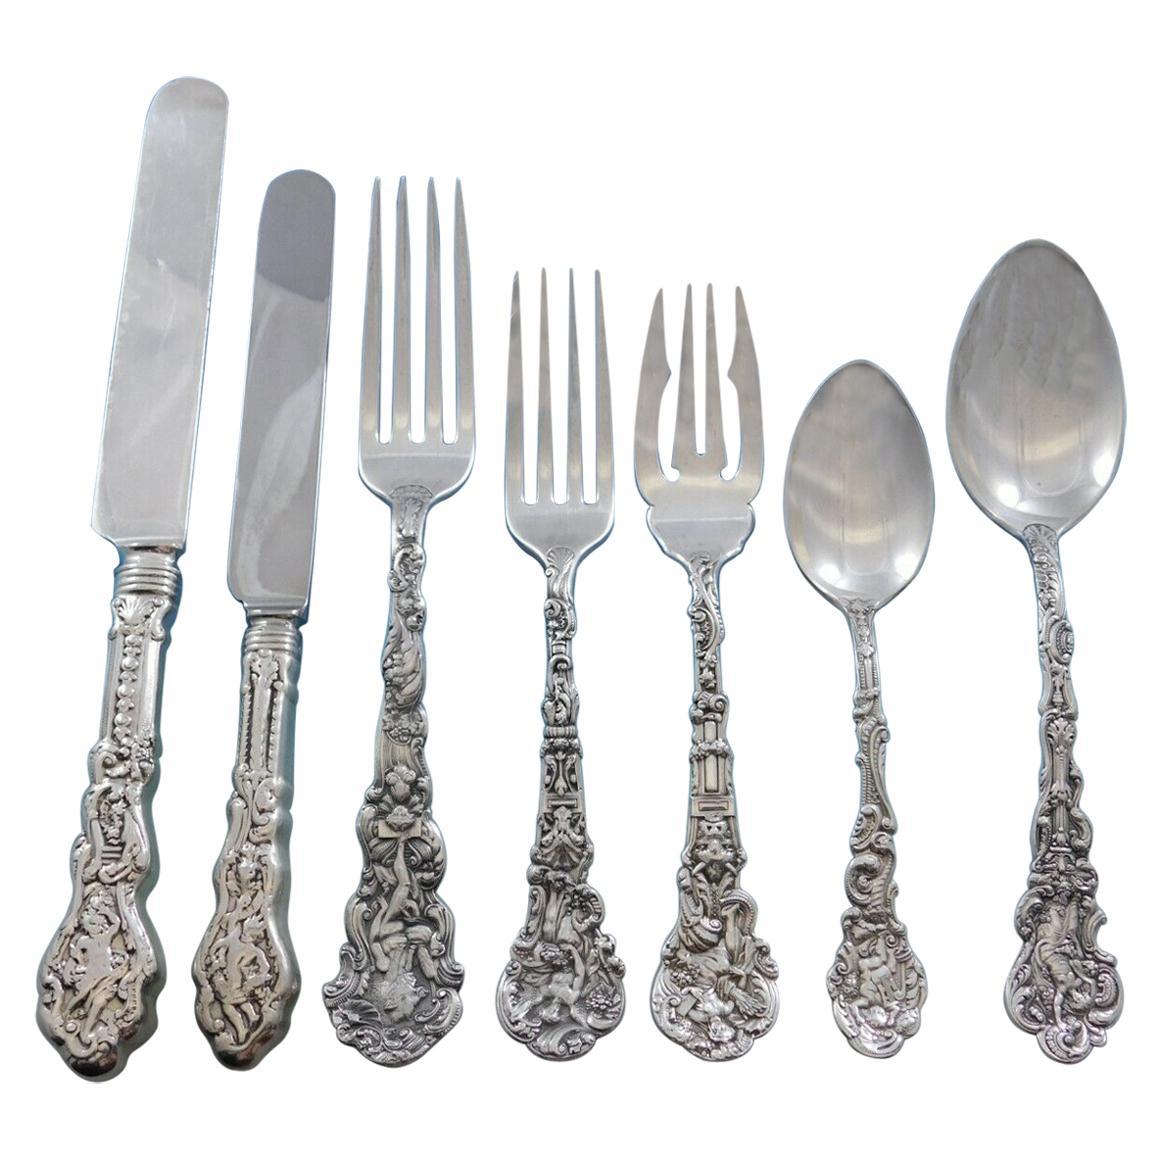 Versailles by Gorham Sterling Silver Flatware Service 12 Set 84 Pieces Dinner